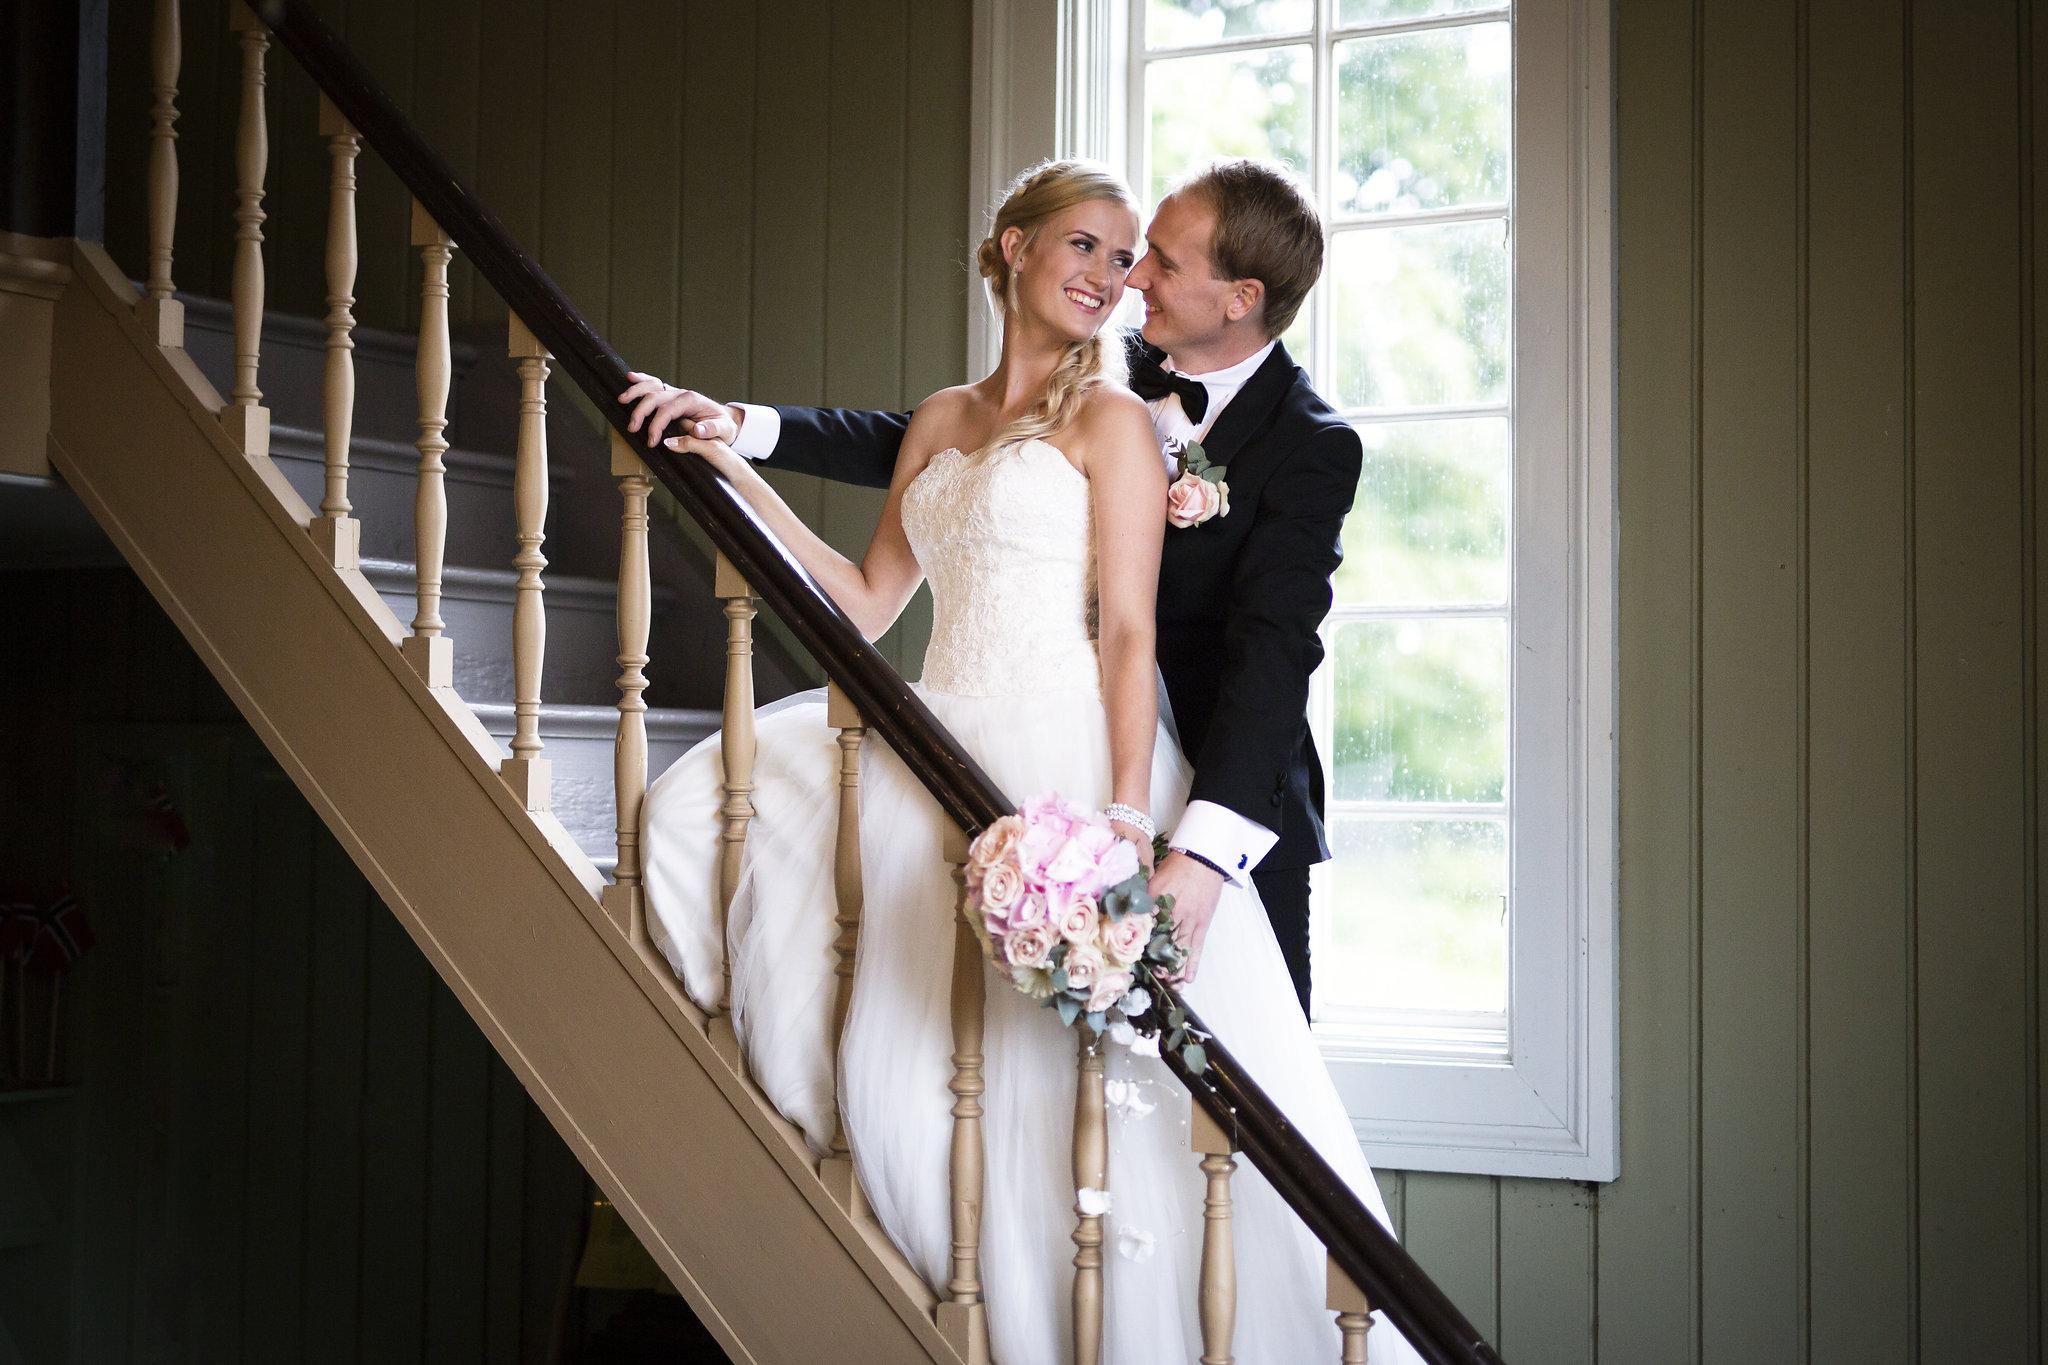 AL_1308_0824-STfotograf-bryllup-tyrifjorden.jpg